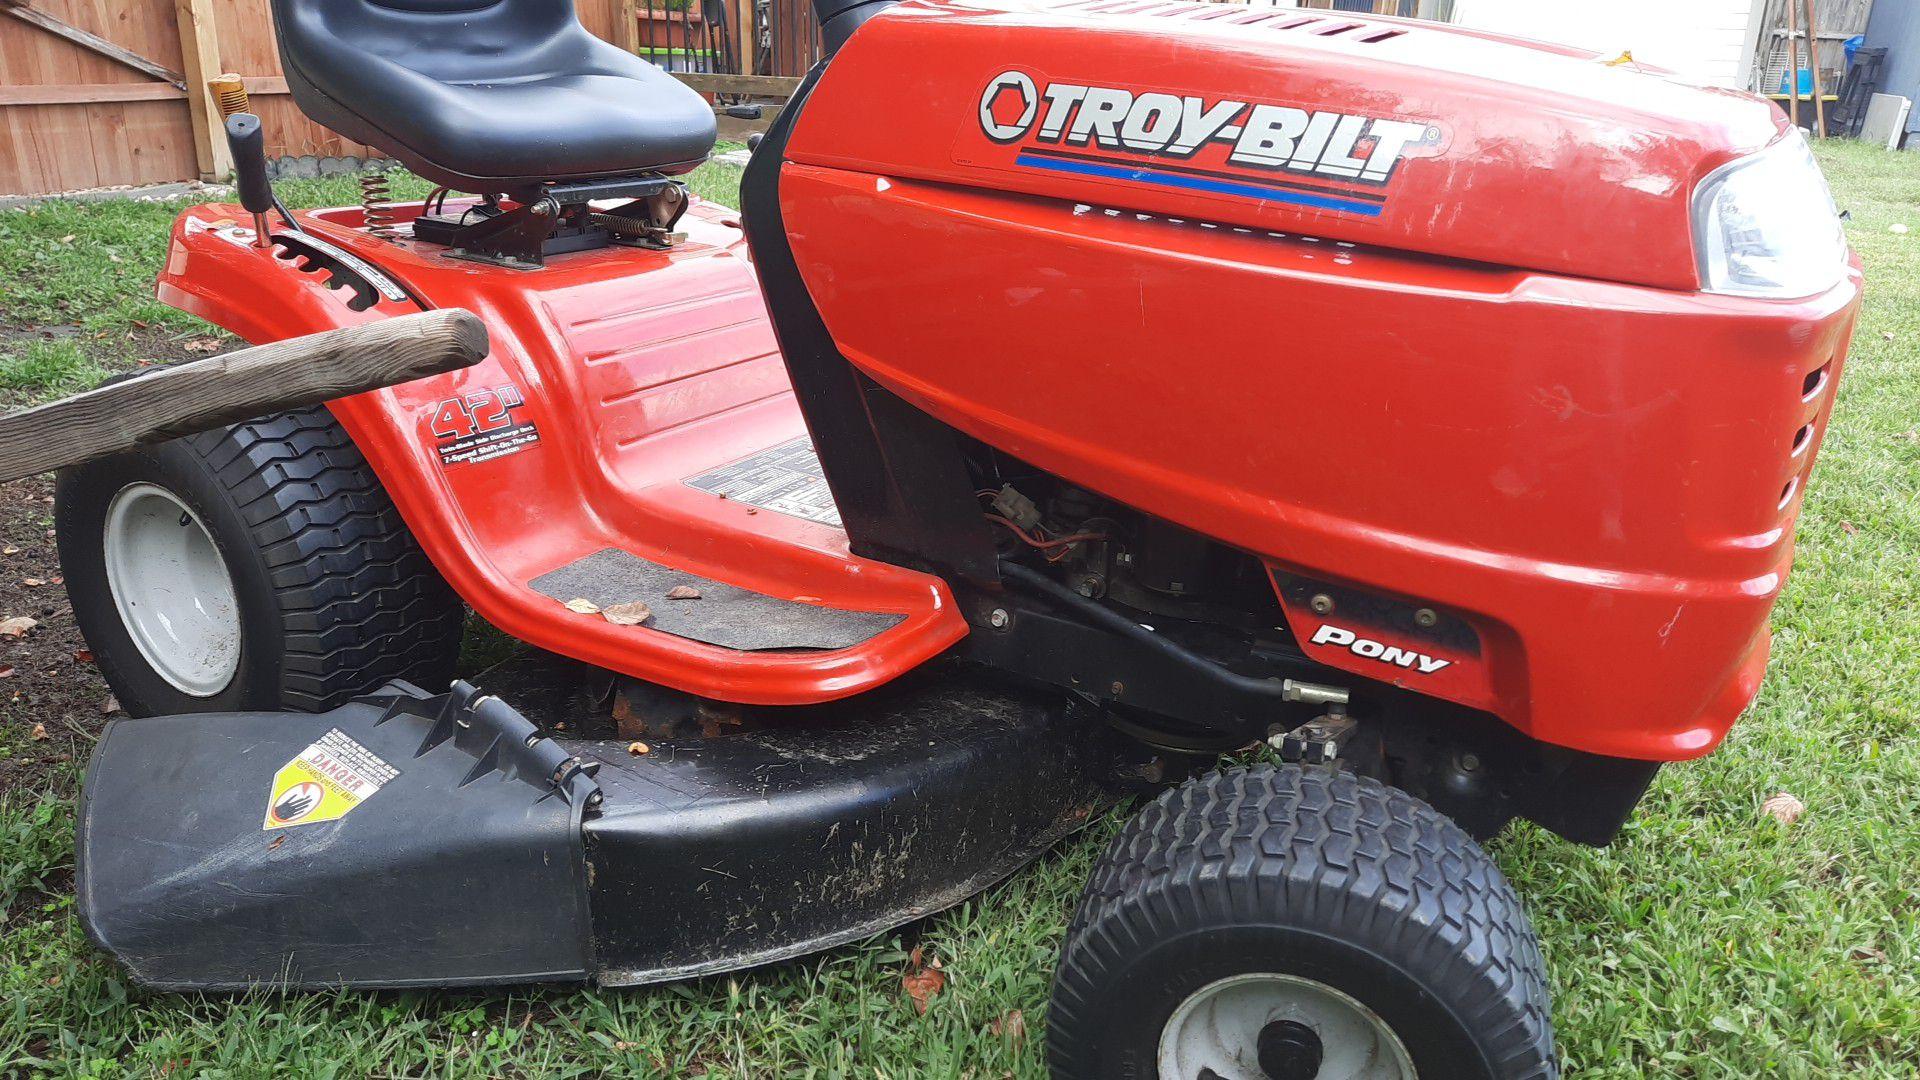 Troy-Bilt riding lawn tractor